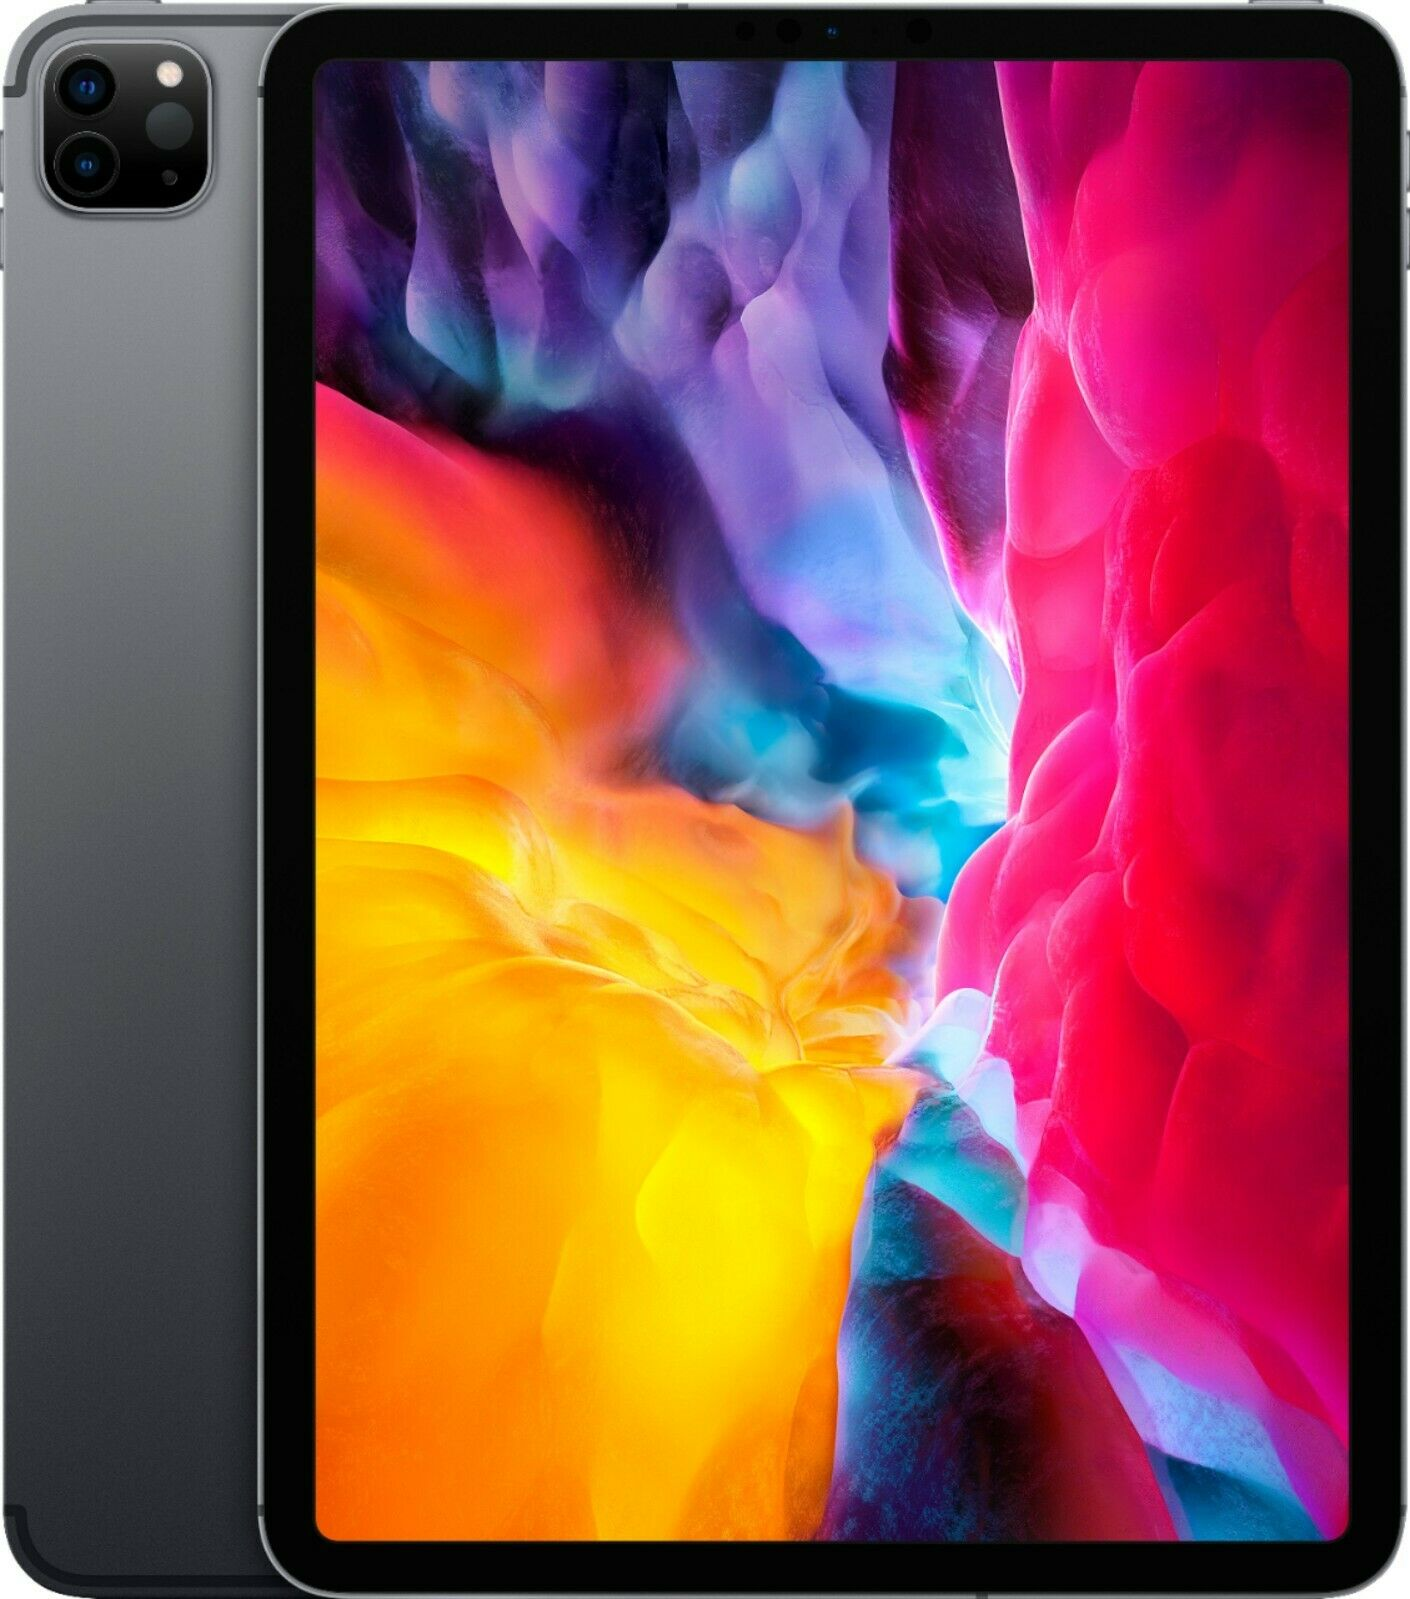 IPad Apple iPad Pro 2020, 512 ГБ, Wi-Fi + 4G (разблокированный), 11 дюймов